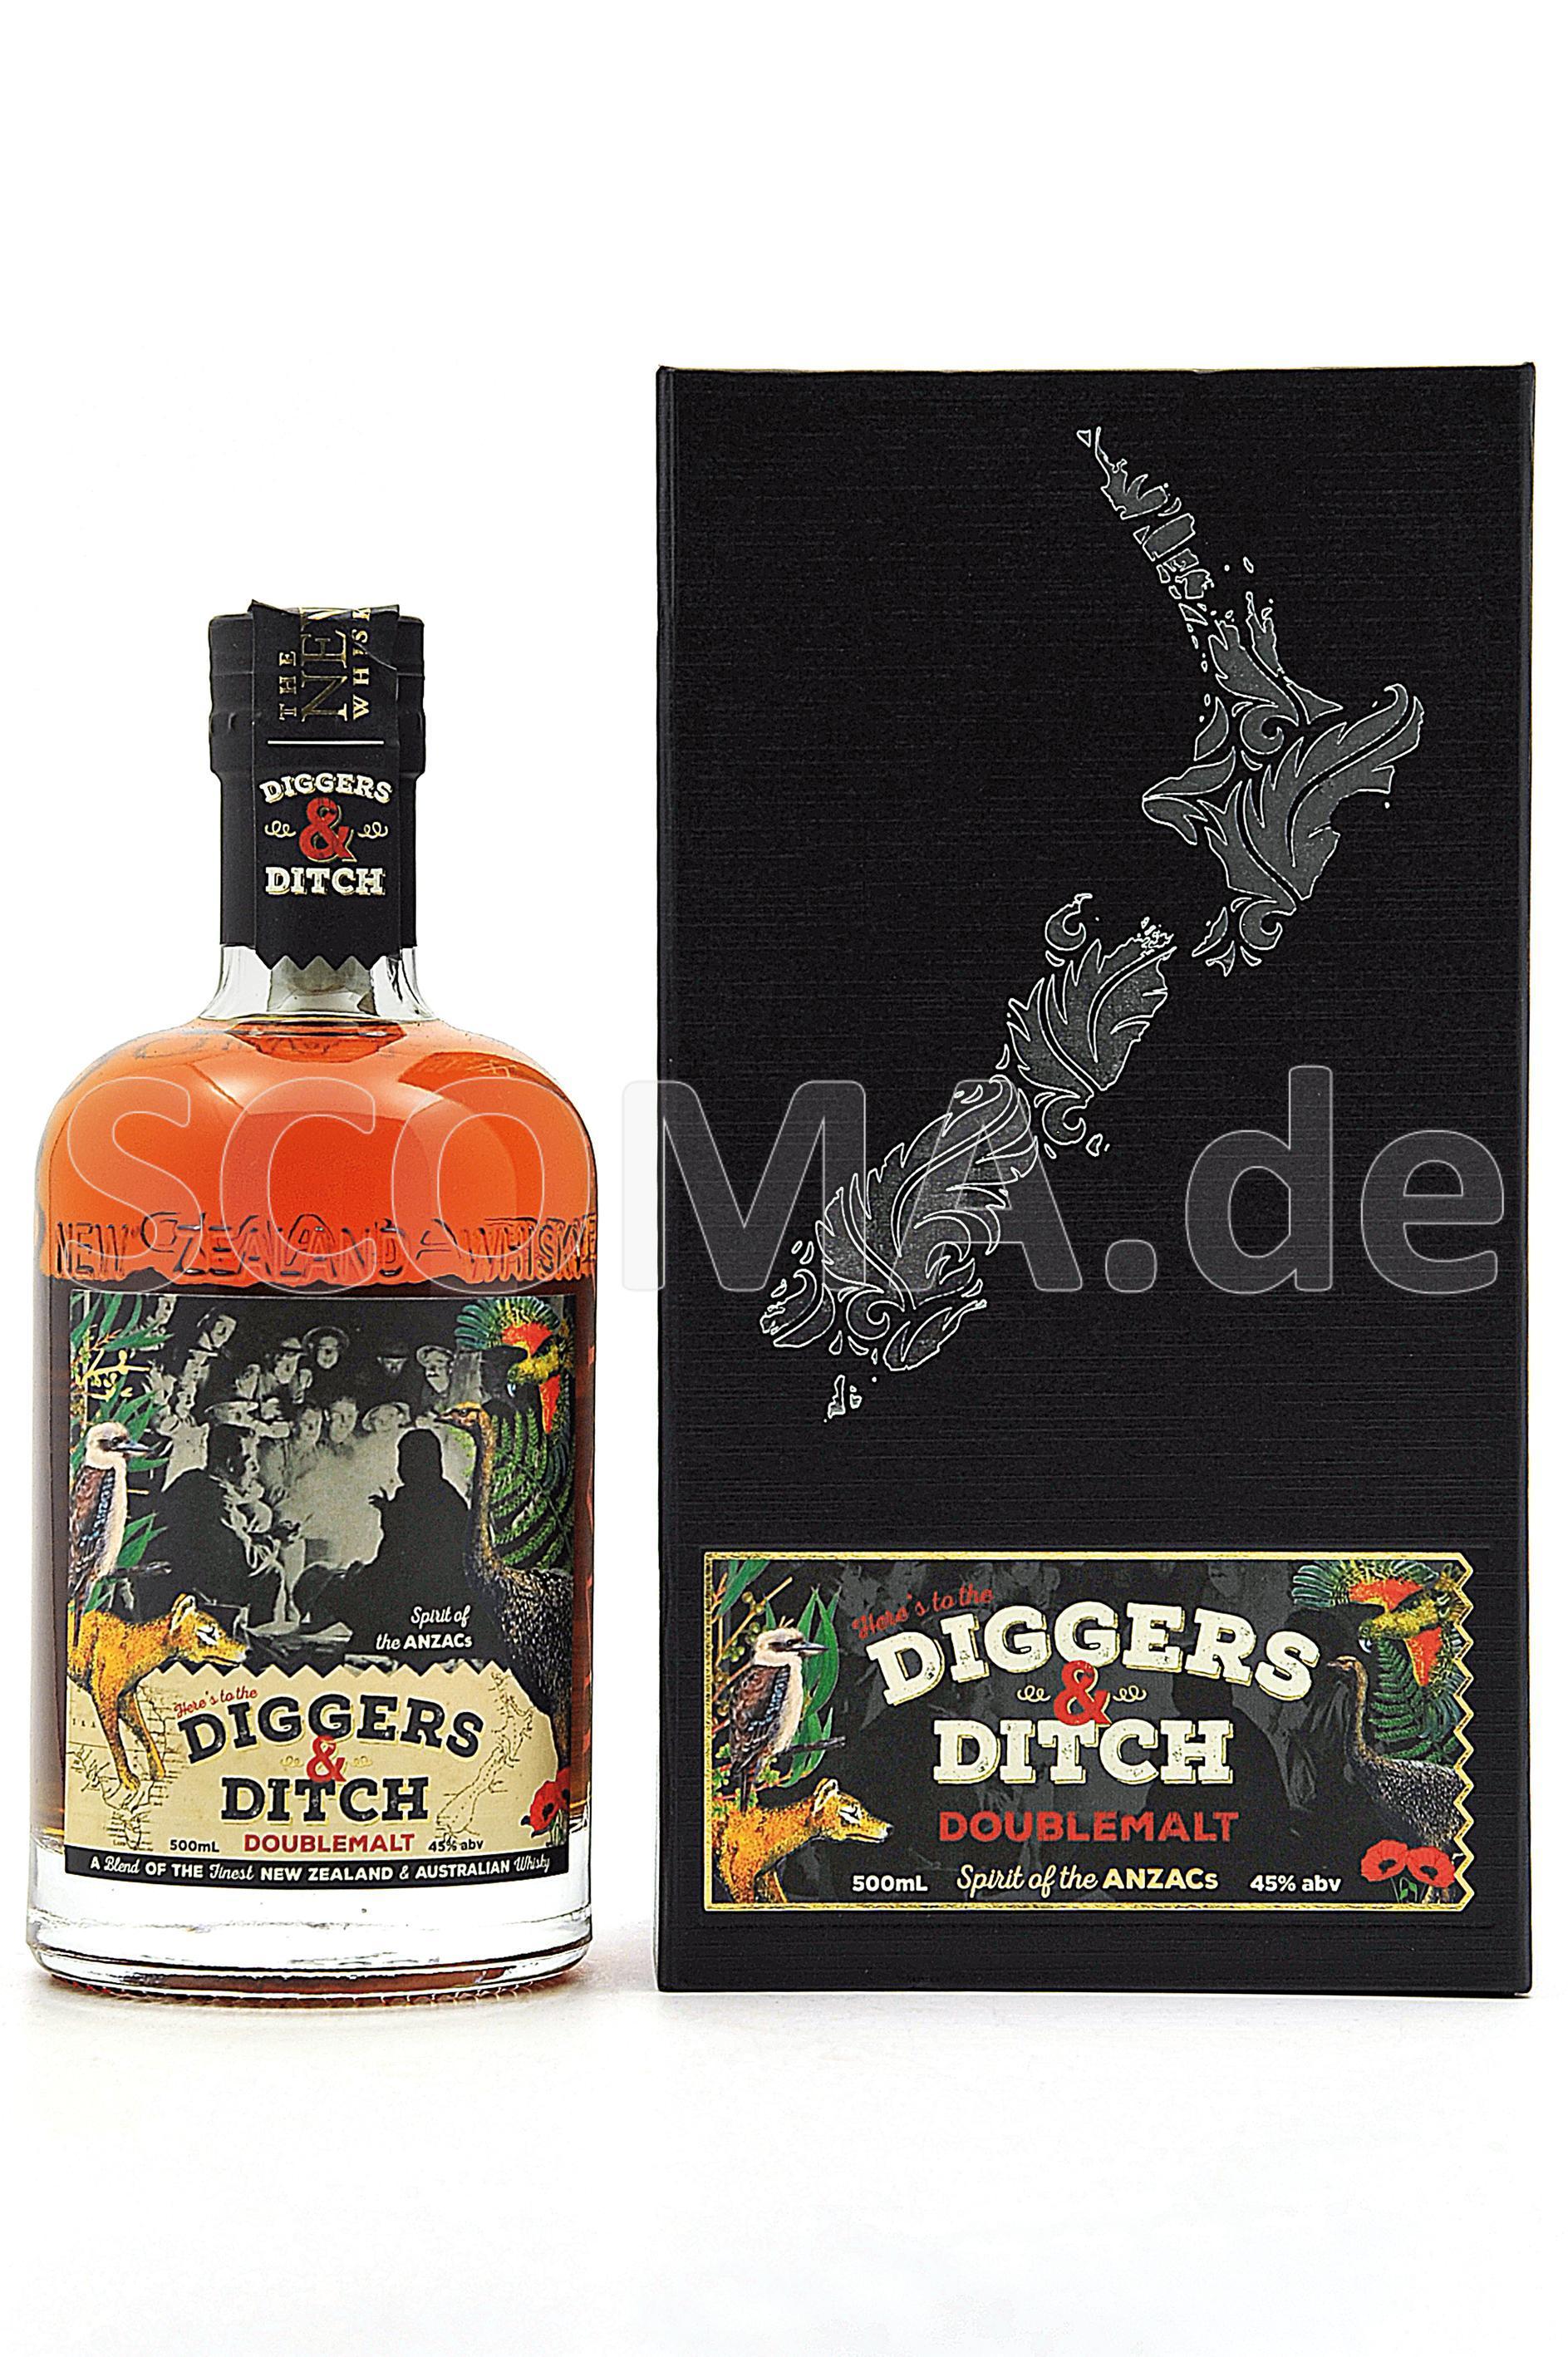 Diggers & Ditch Doublemalt